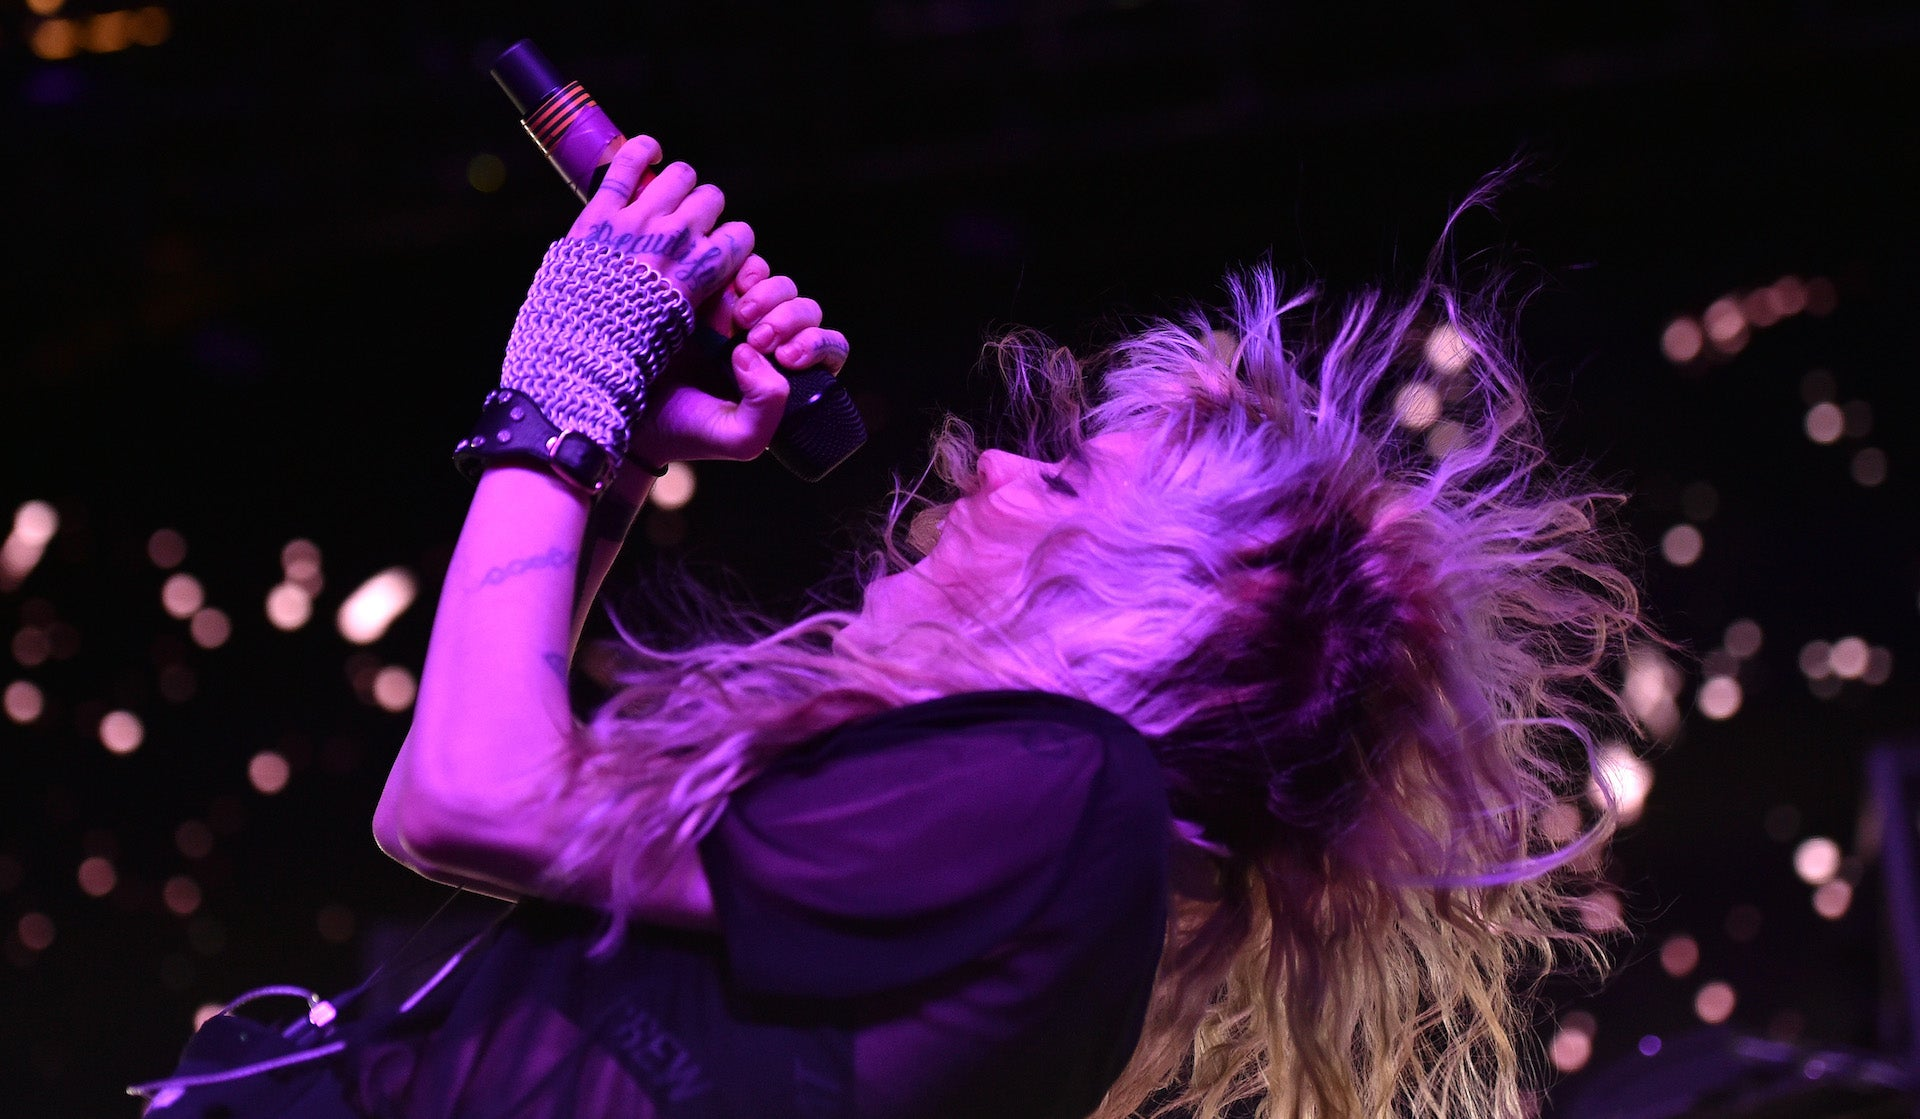 I Followed Grimes's Arcane Training Regimen, Unlocked The Powers Of My Soul, And Cut My Hand